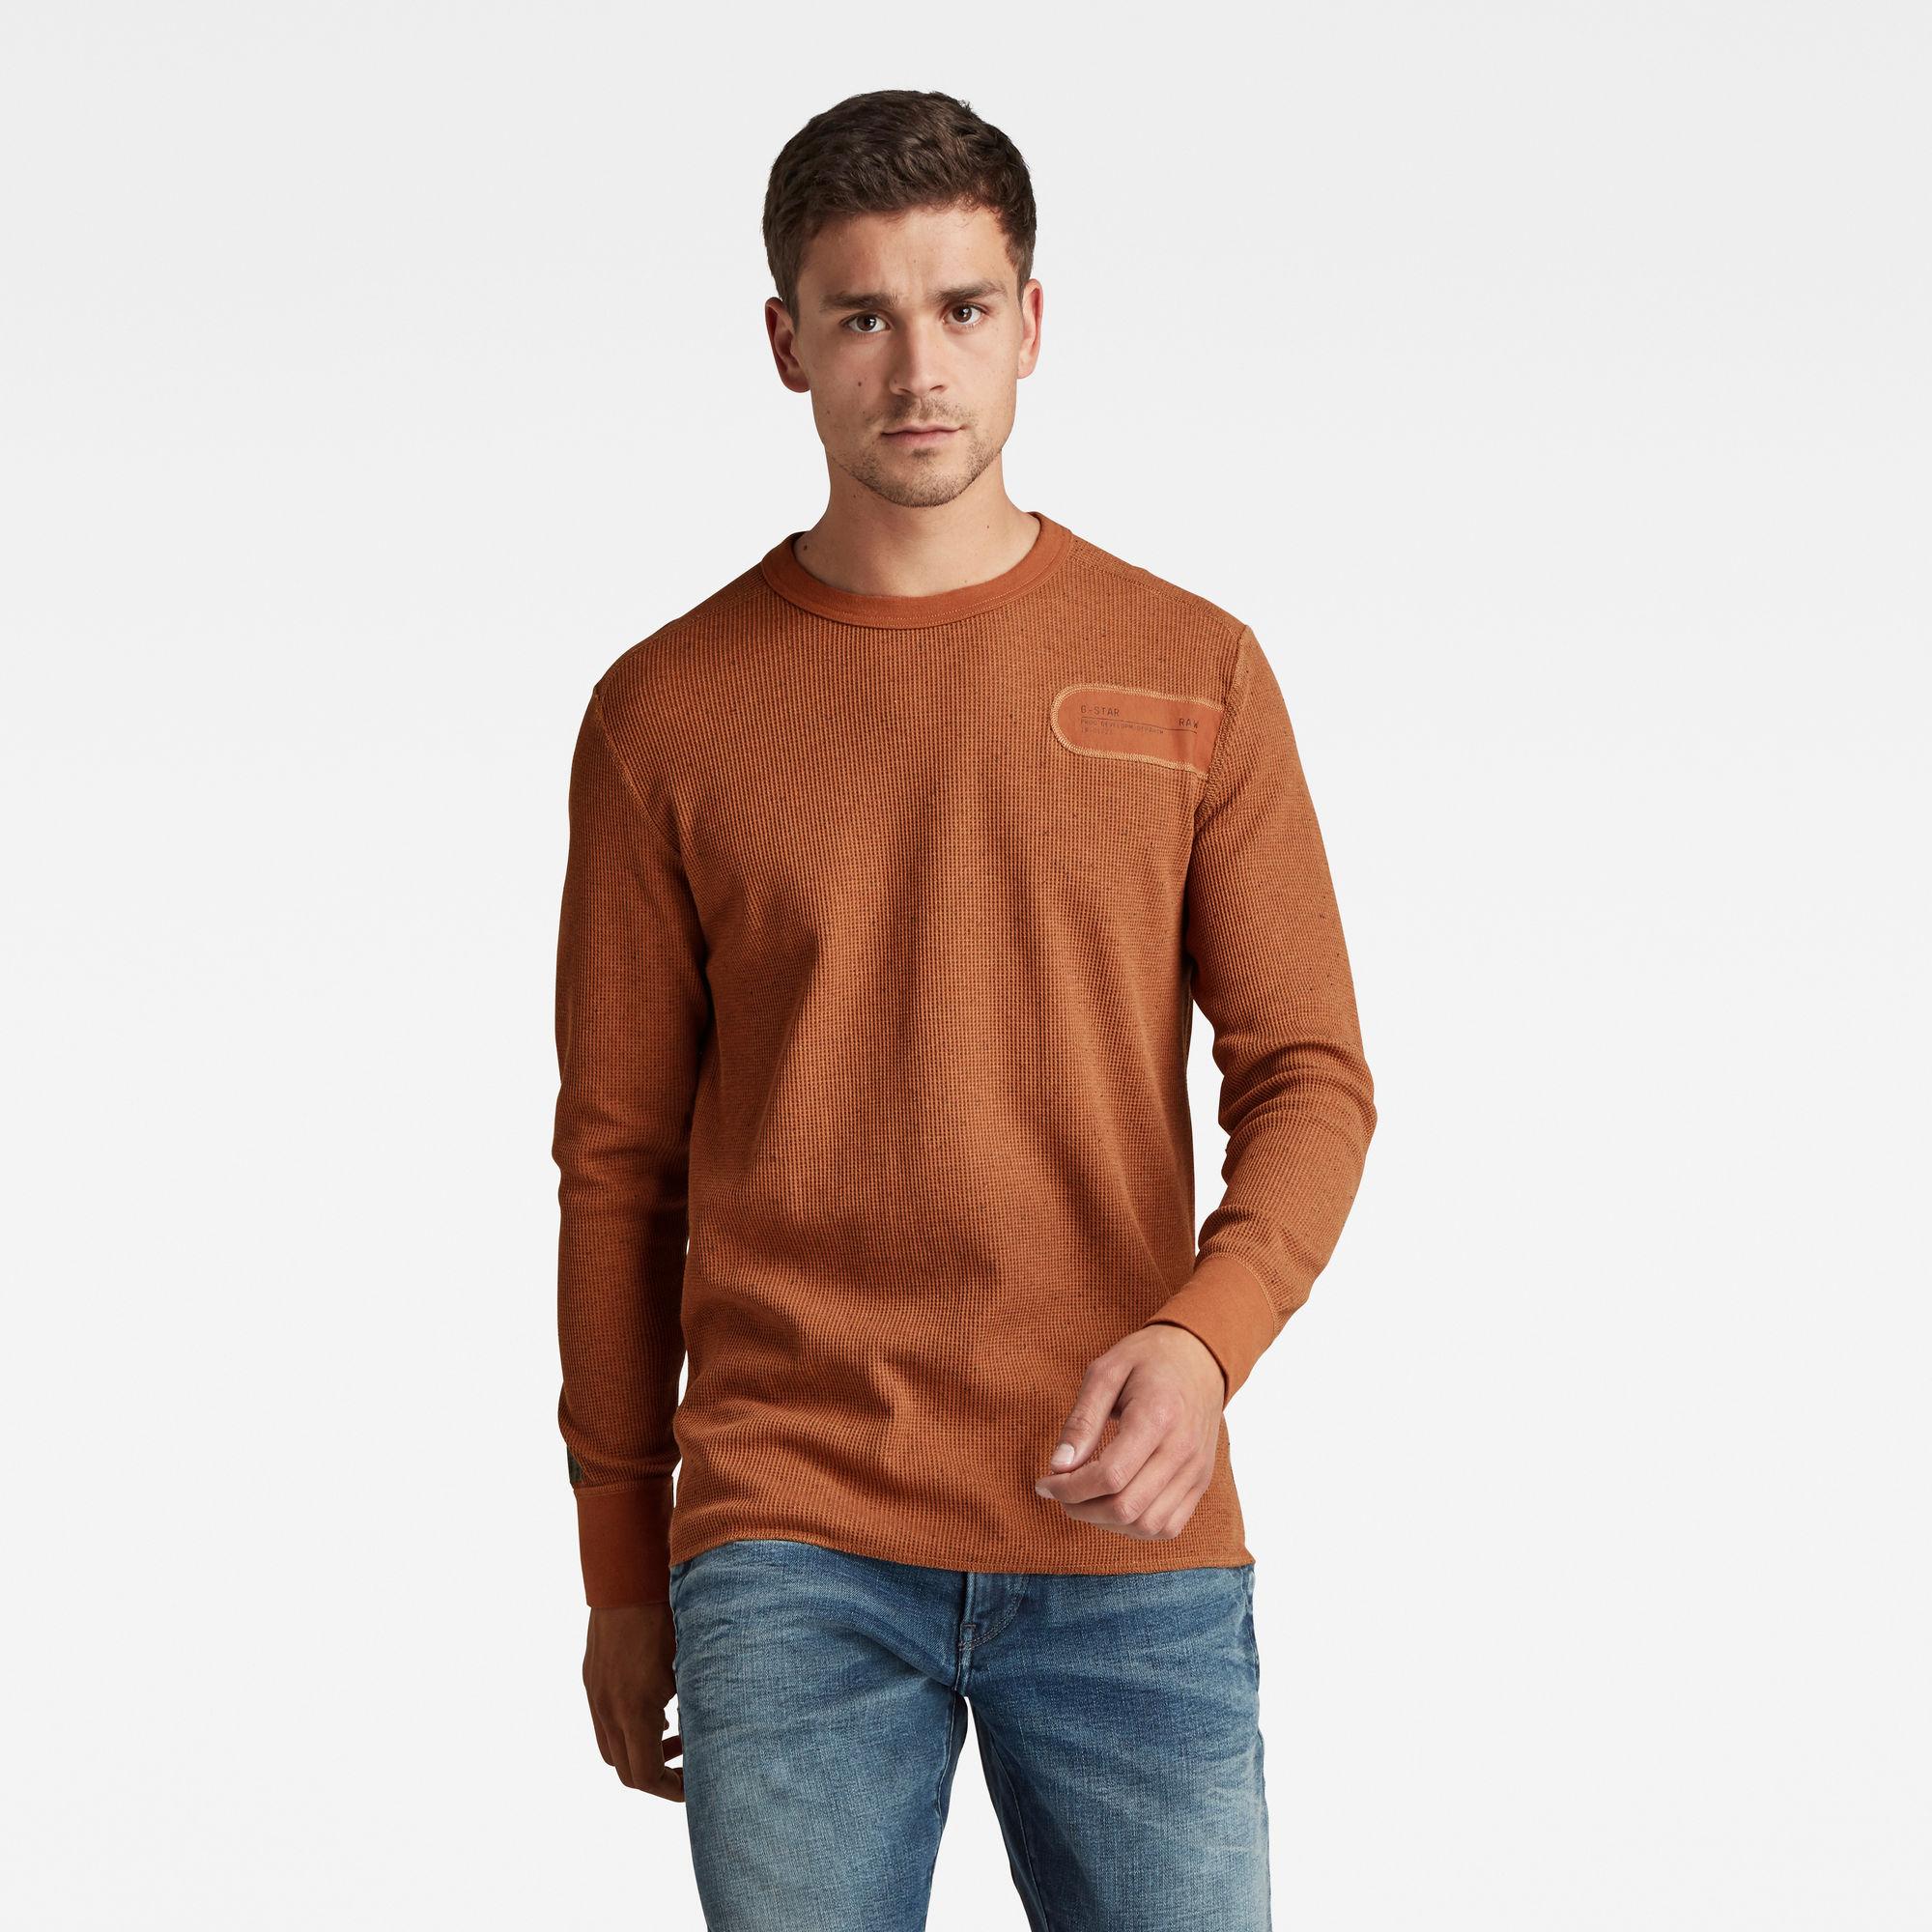 G-Star RAW Heren Heather Waffle Raw Construction T-Shirt Oranje